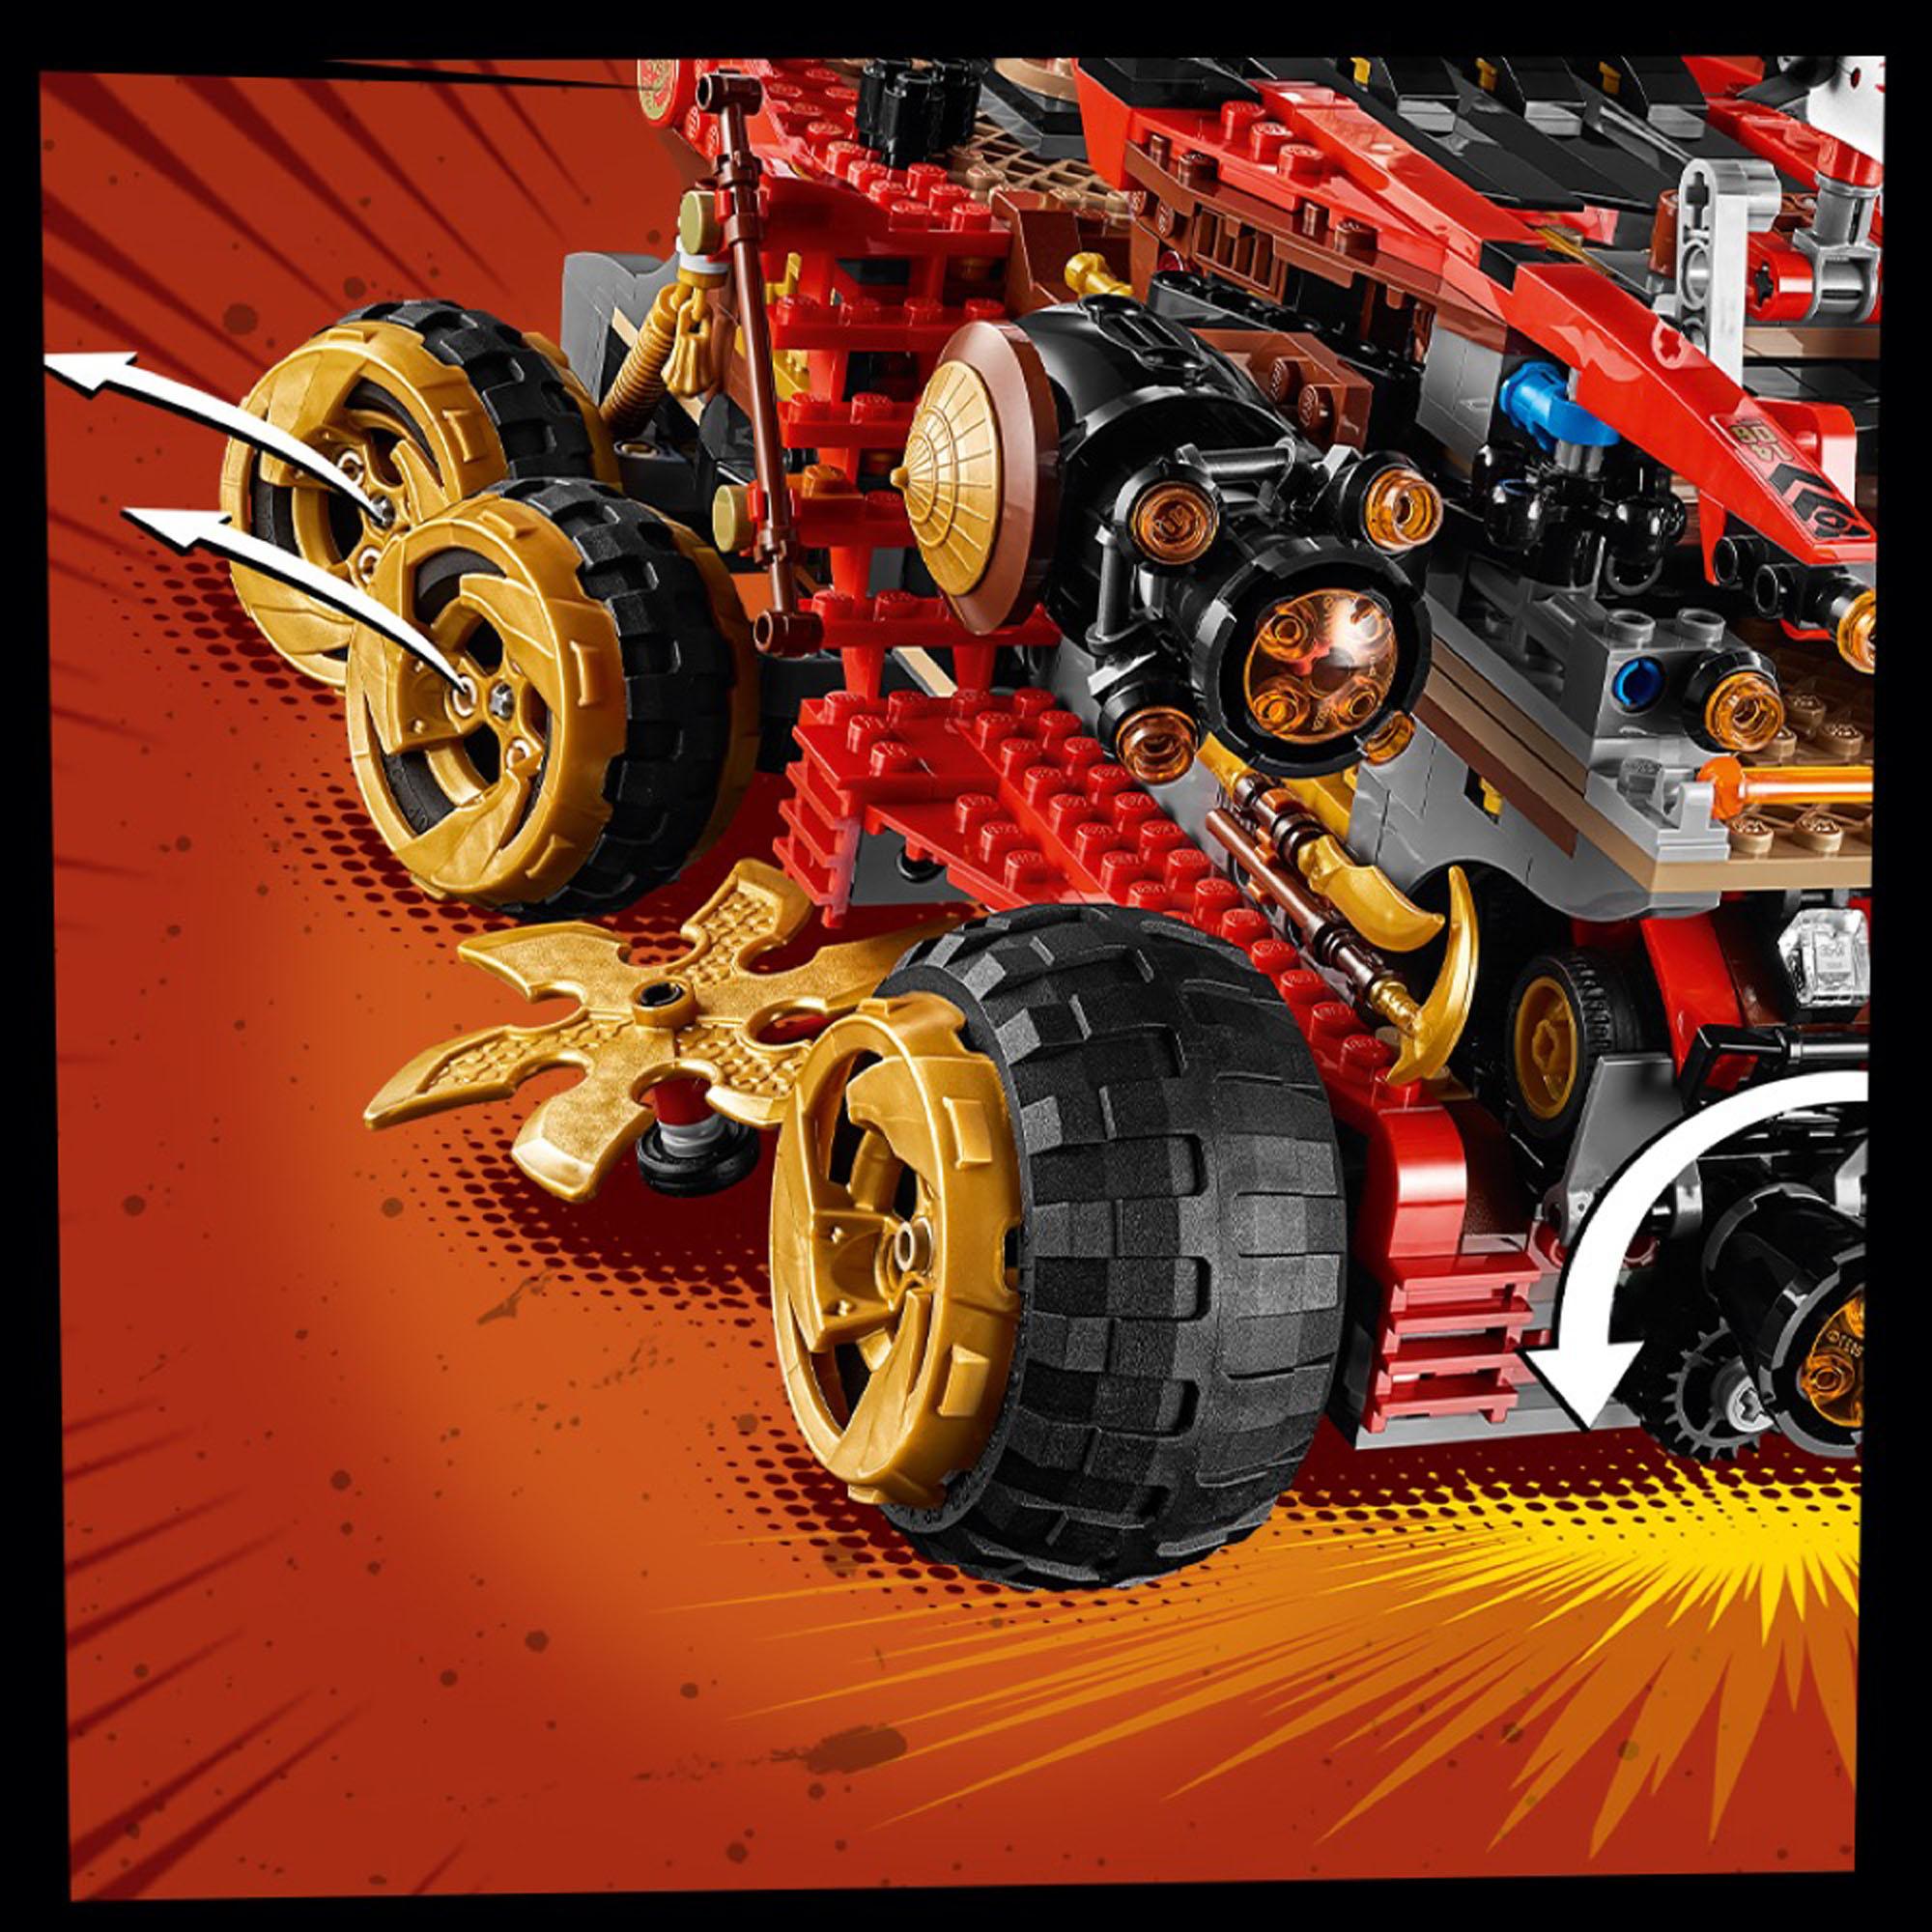 70677 LEGO NINJAGO LAND BOUNTY VEICOLO ACTION-imballato ...